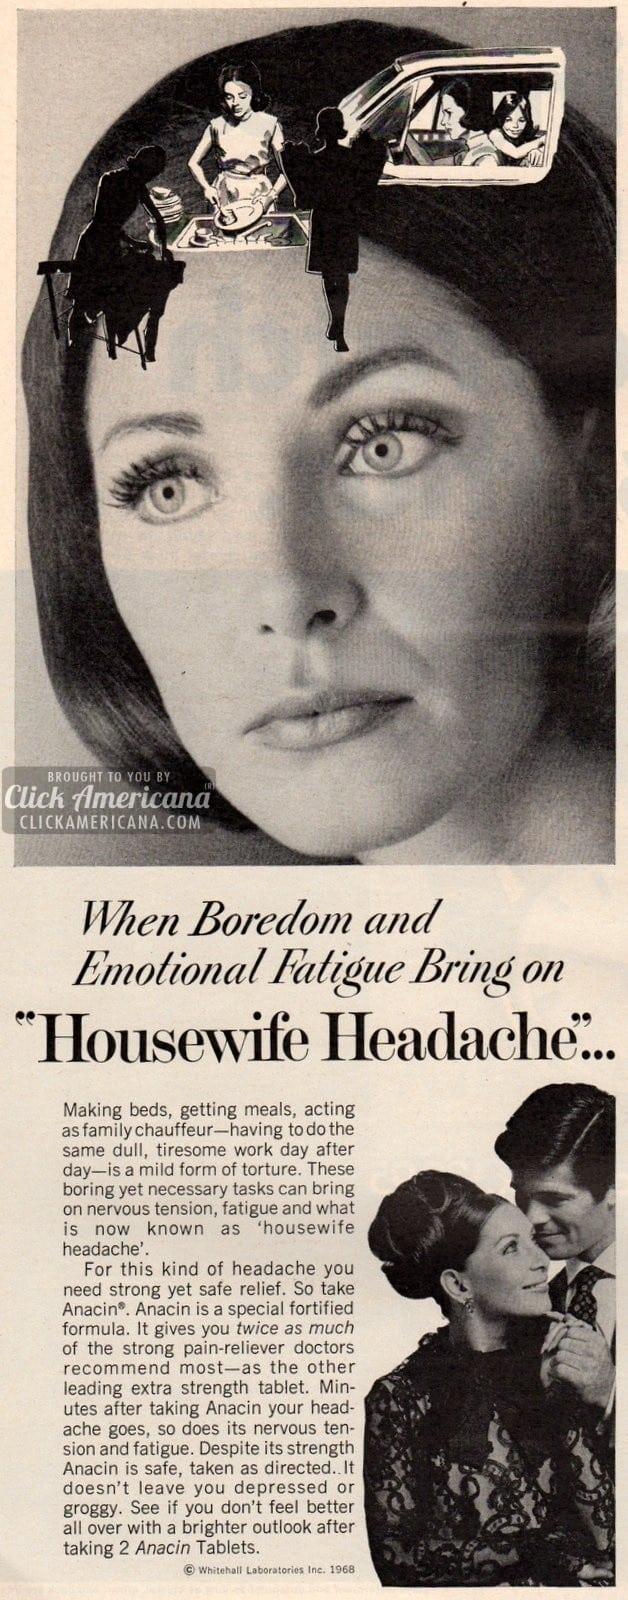 Housewife Headache from boredom, emotional fatigue (1968-9)